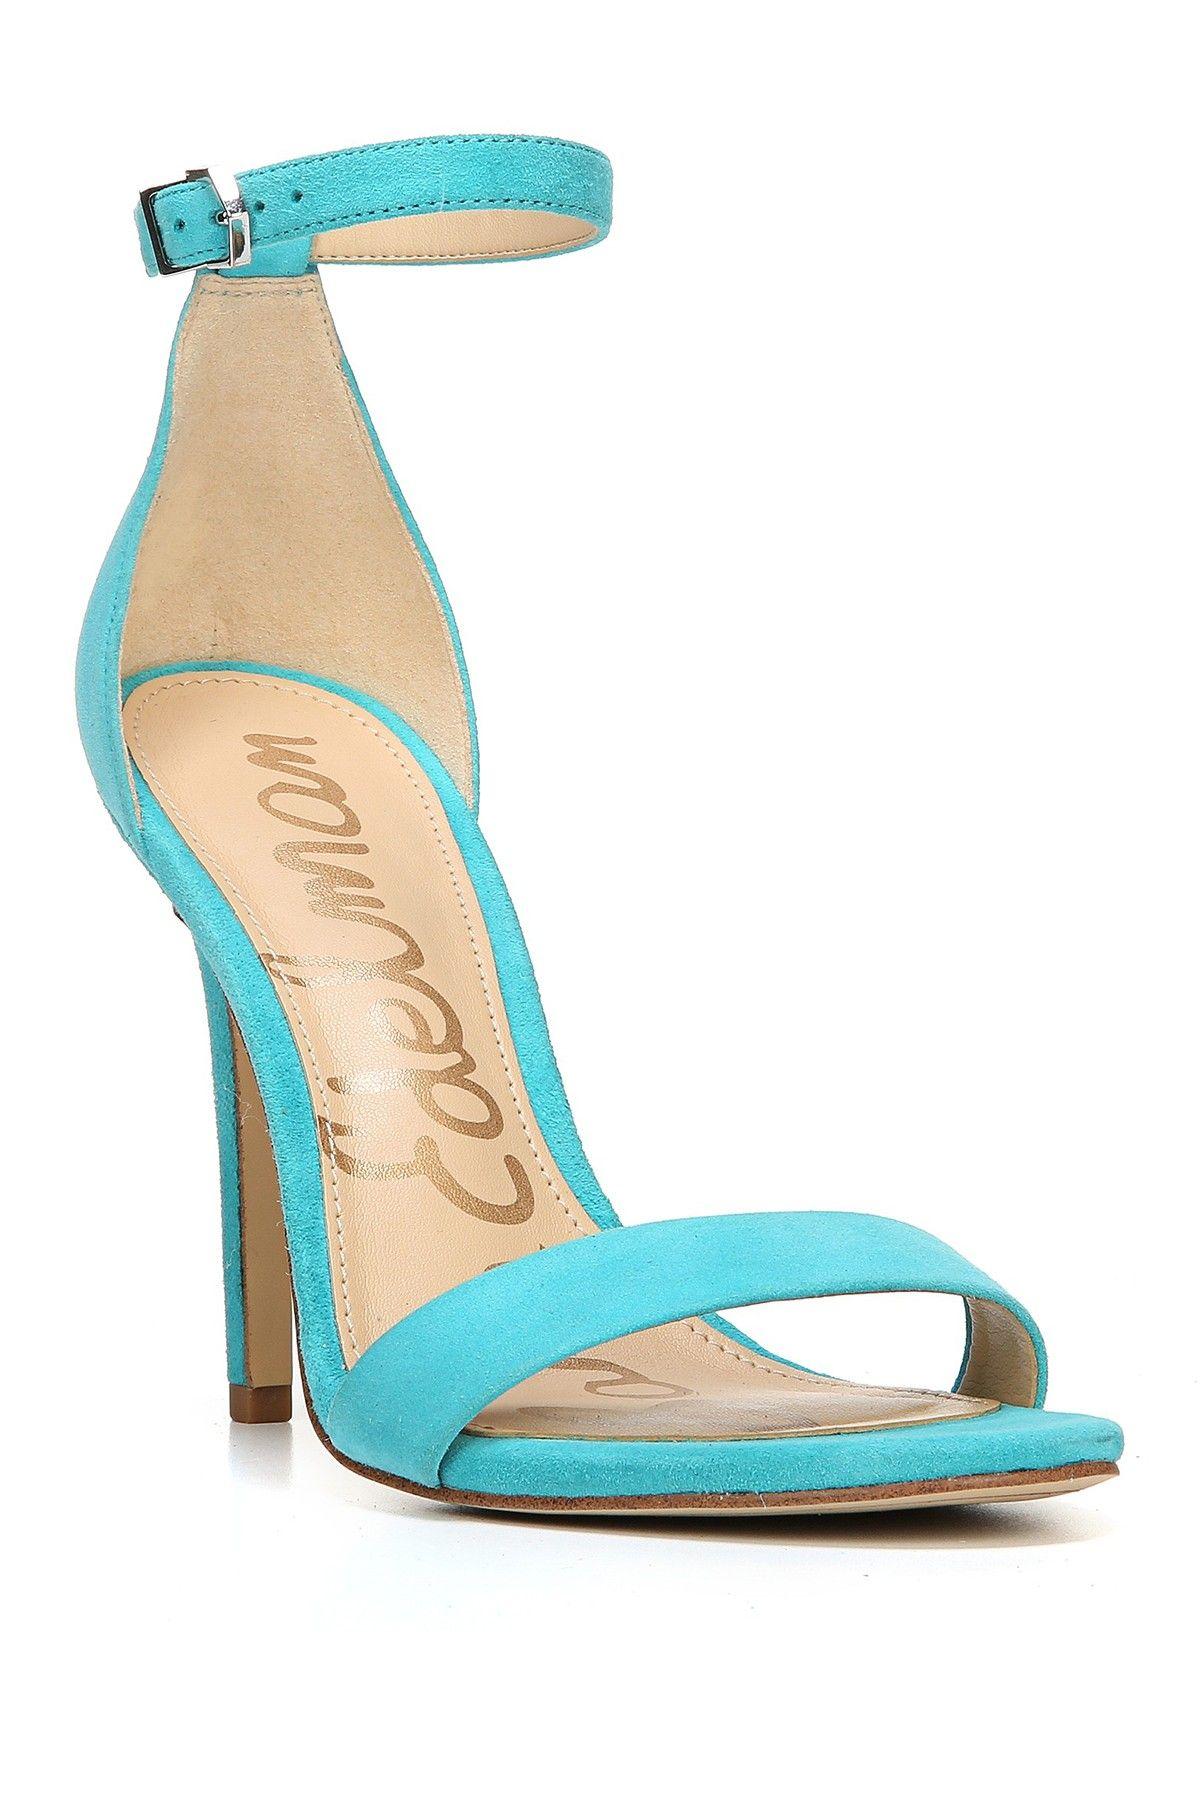 3452a60f1c99b3 Sam Edelman - Amee Ankle Strap Heel Sandal